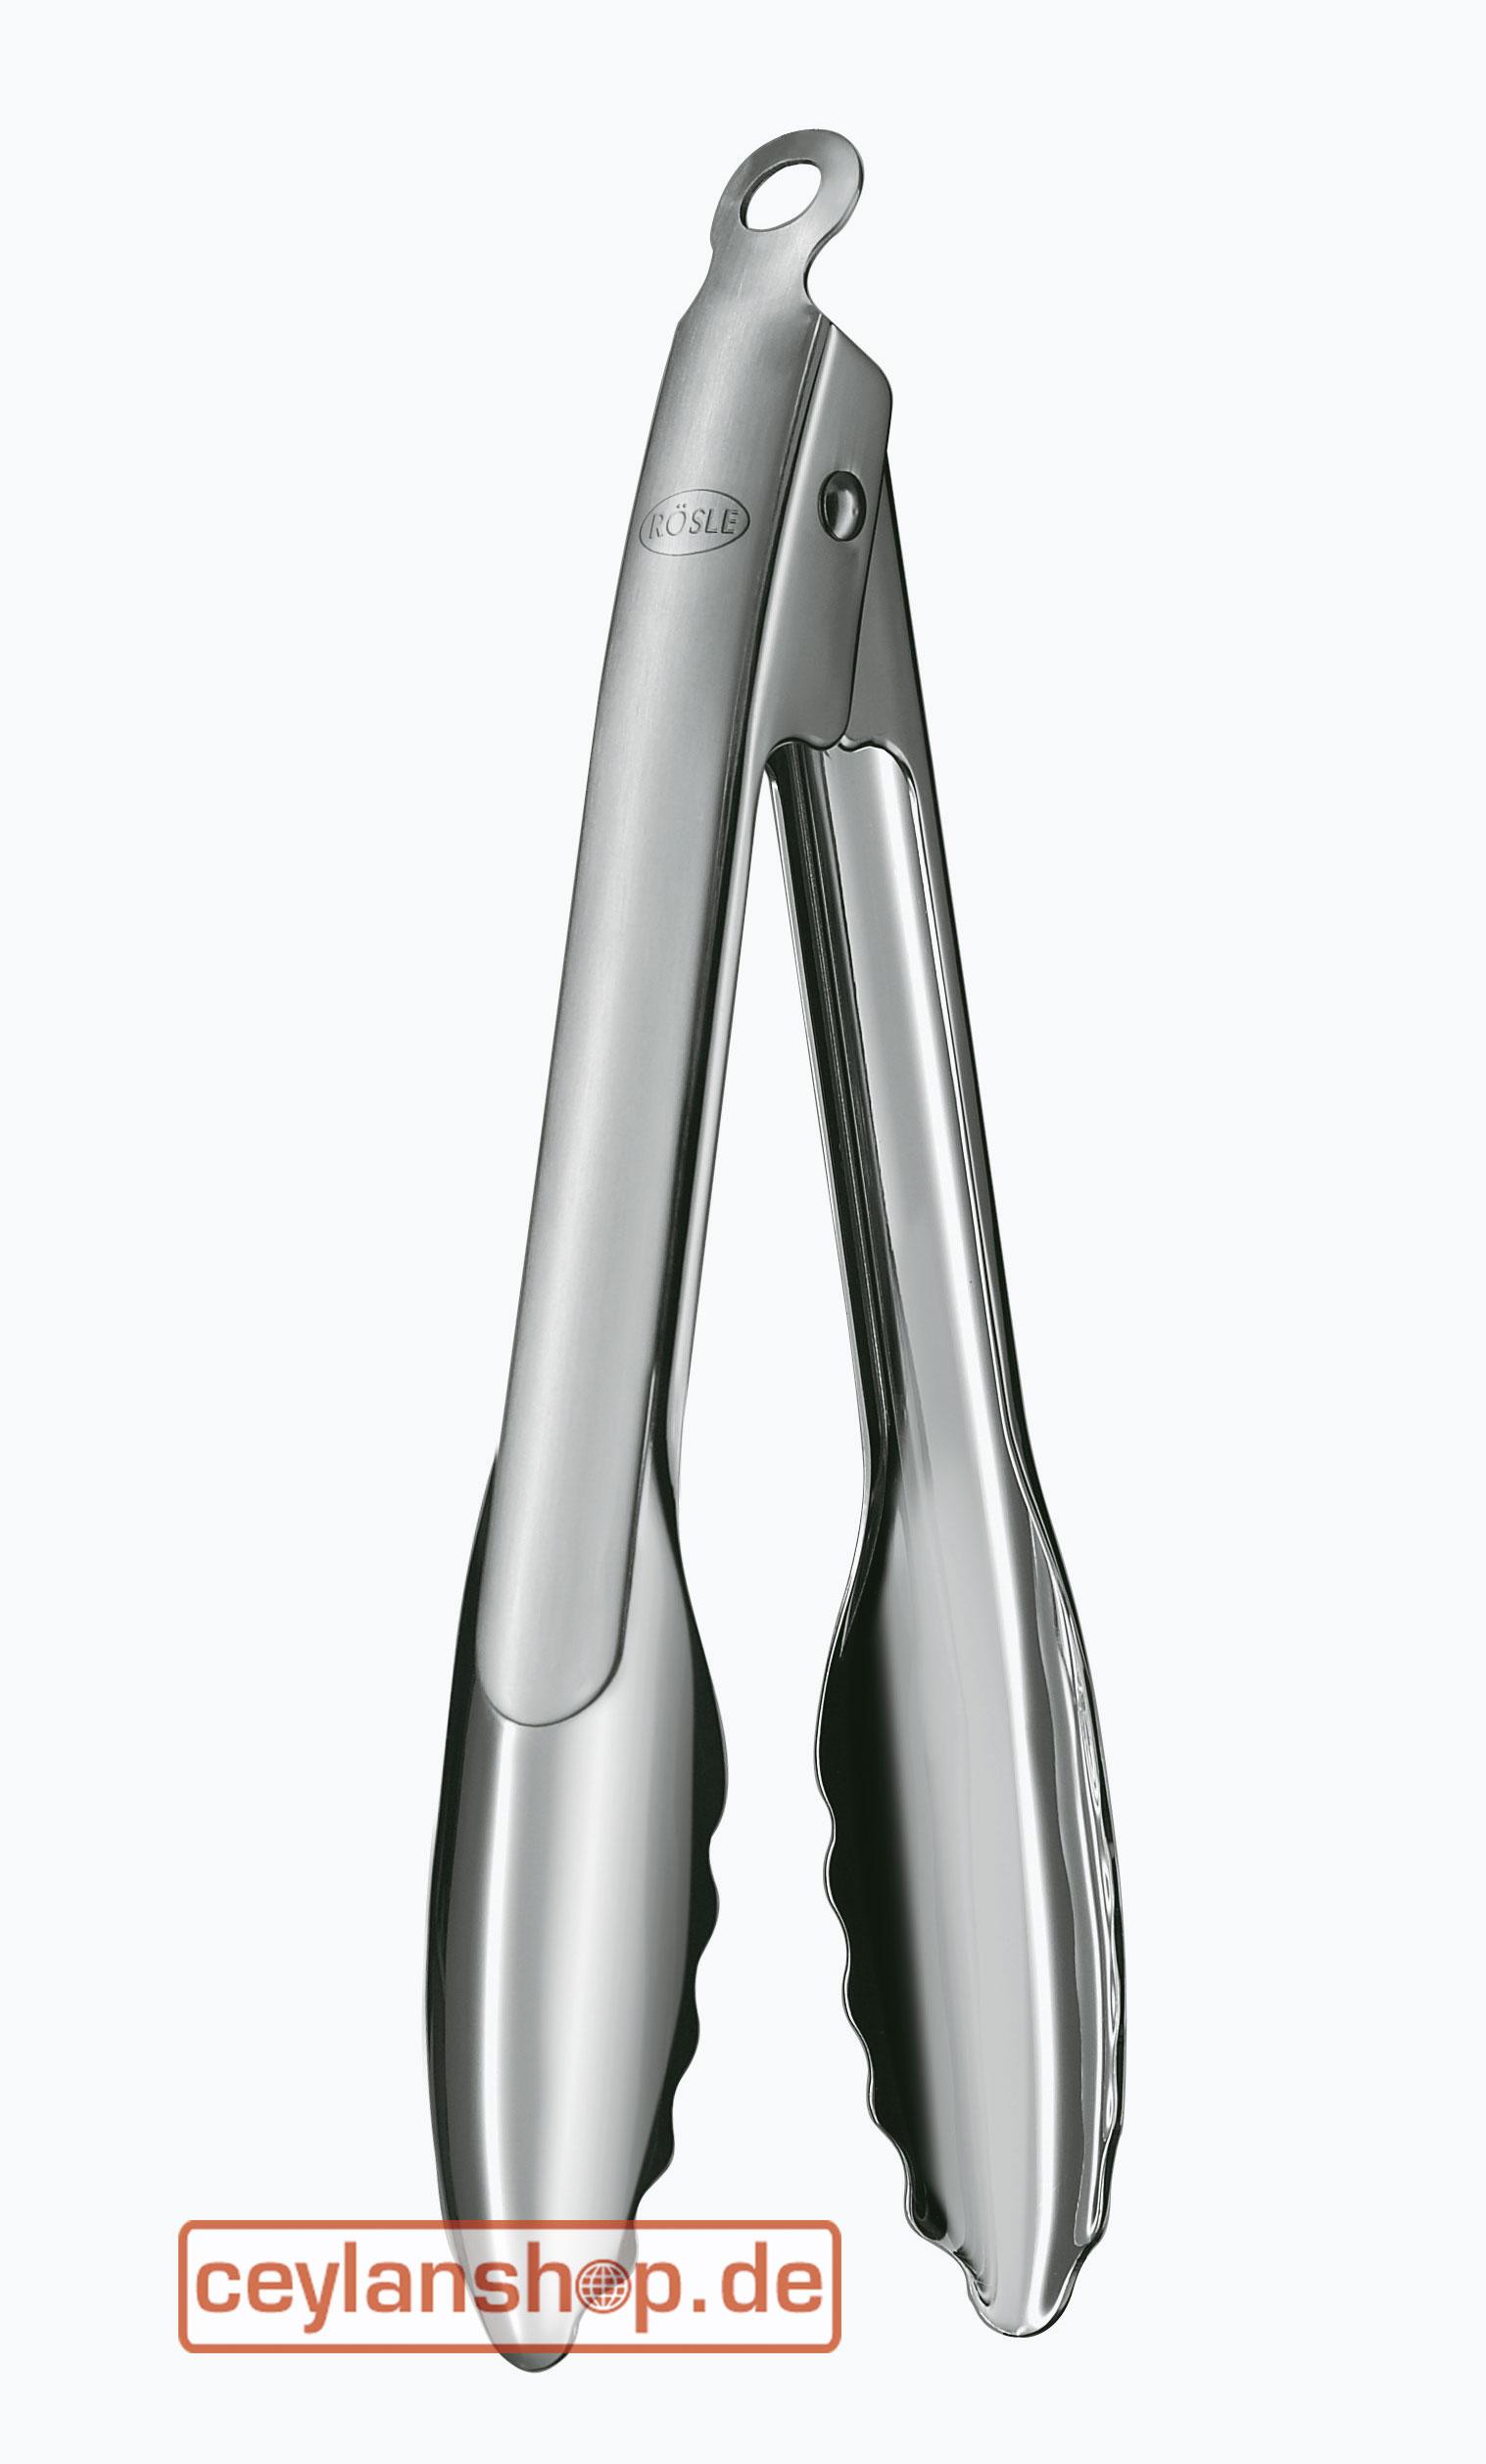 MagiDeal Edelstahl Servierzange - 26,5cm L/änge: ca. 26,5cm//32,5 cm auswahlen K/üchenzange Spaghettizange